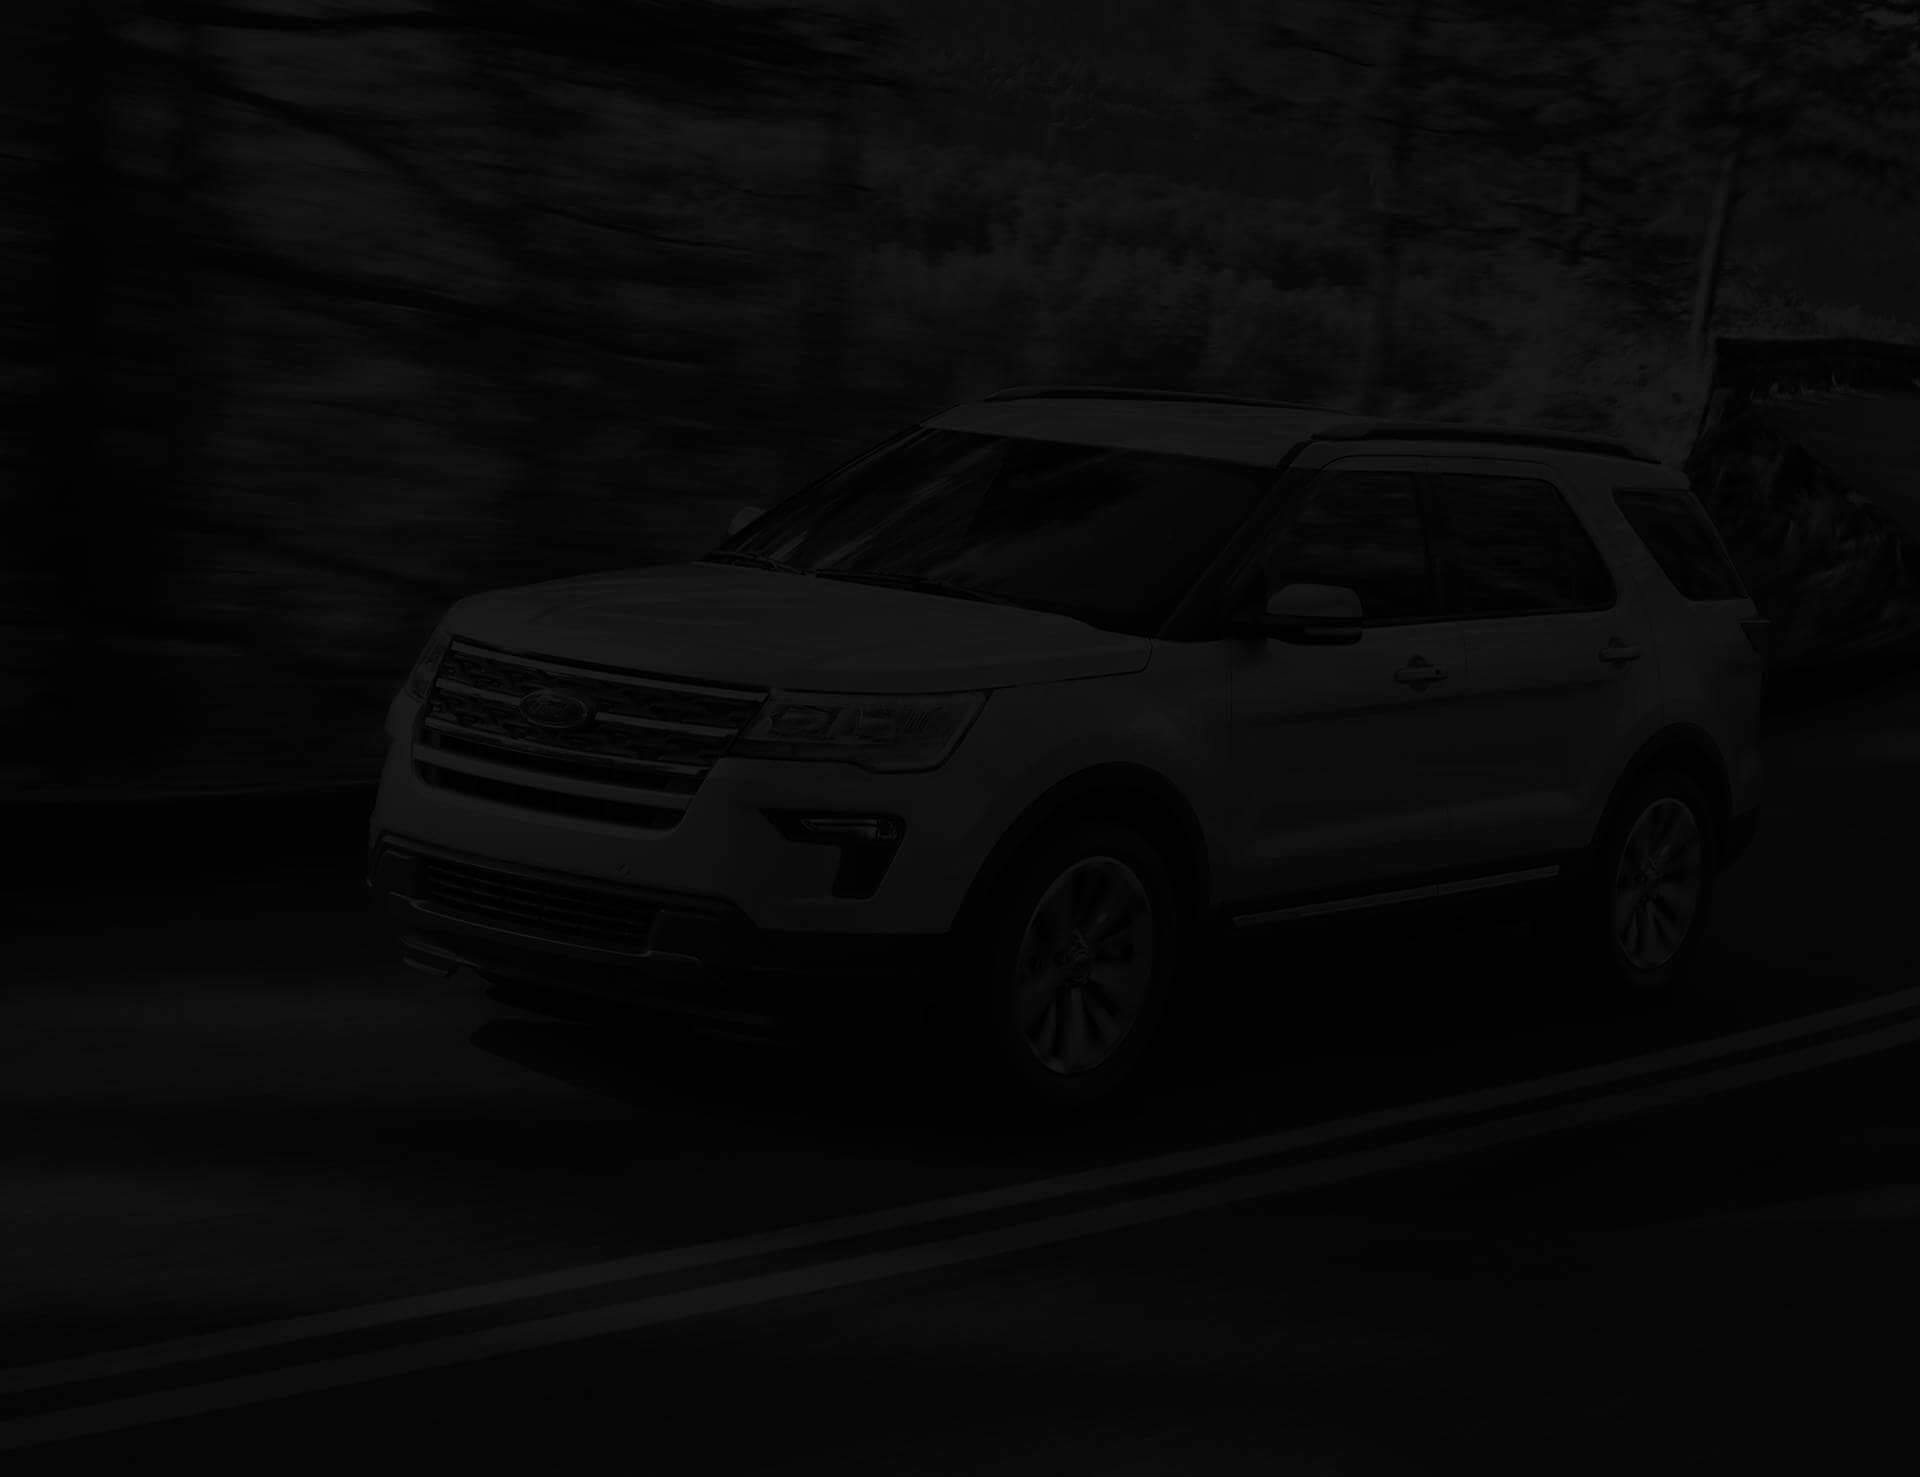 New & Used Ford Cars, Trucks & SUVs Dealership in Calgary, AB